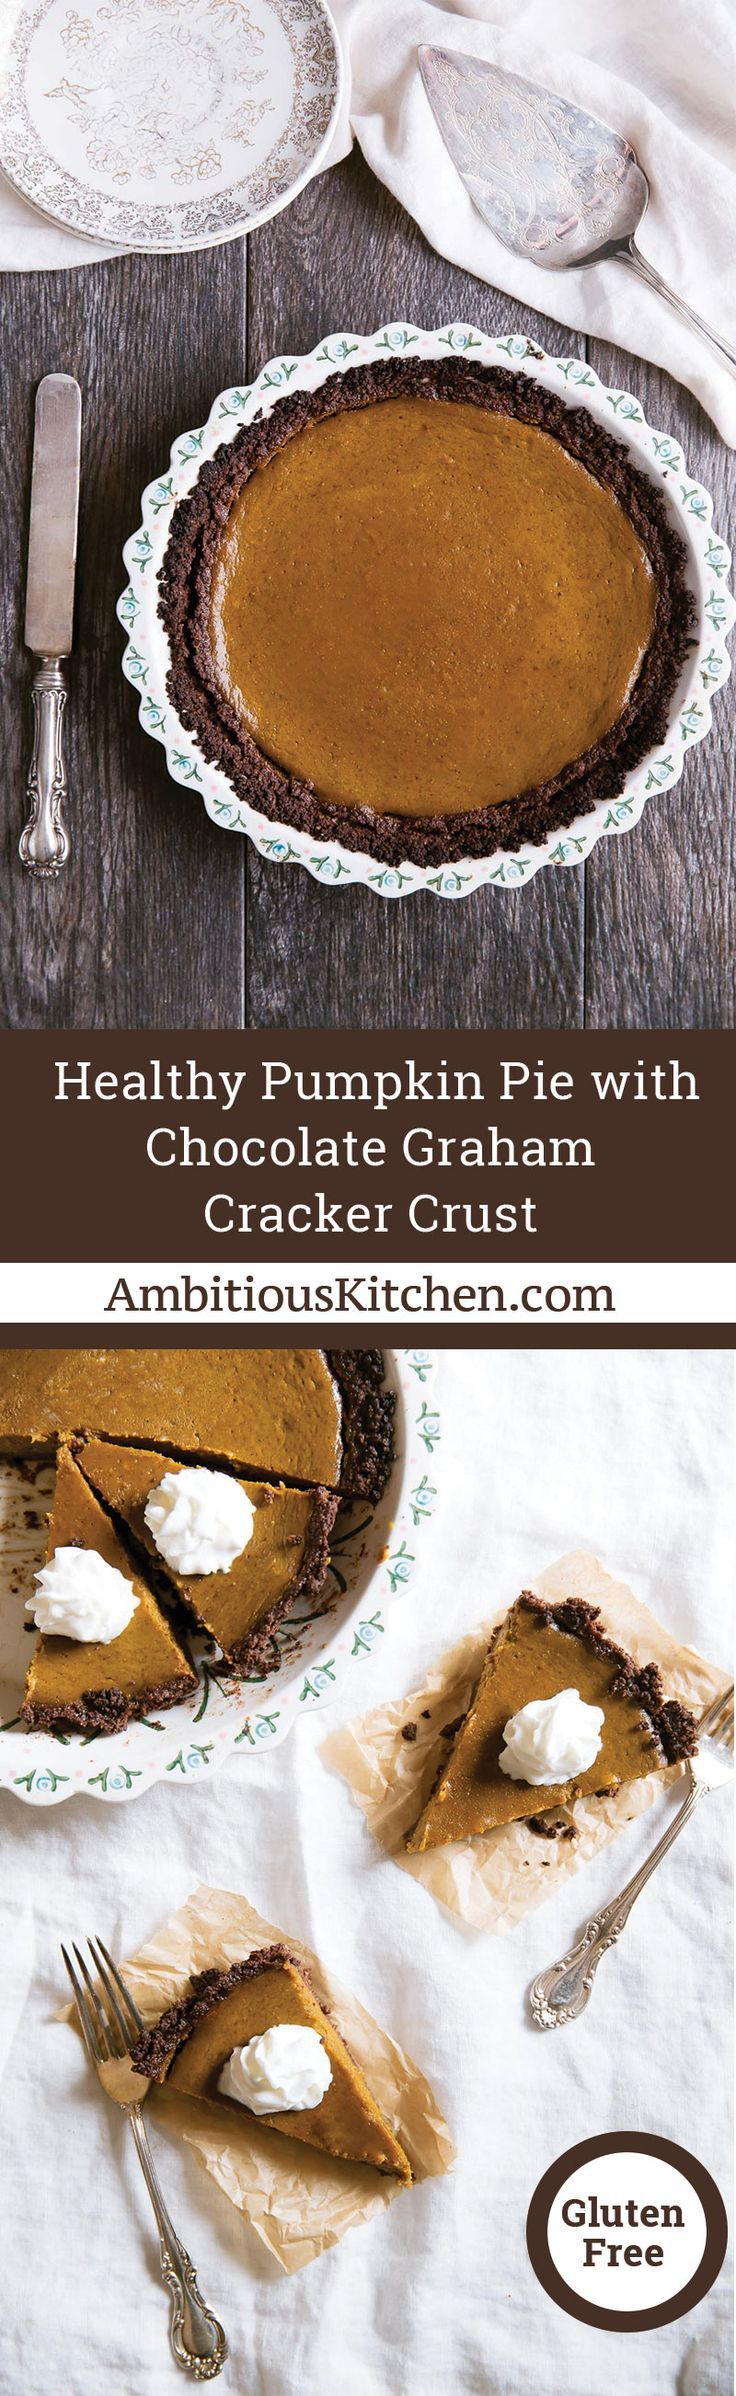 Healthy Pumpkin Pie with a gluten free chocolate graham cracker crust. Beautiful, velvet texture and full of pumpkin pie spices. #healthypumpkinpie #glutenfreepie #thanksgivingdessert #healthydessert #falldessertrecipe